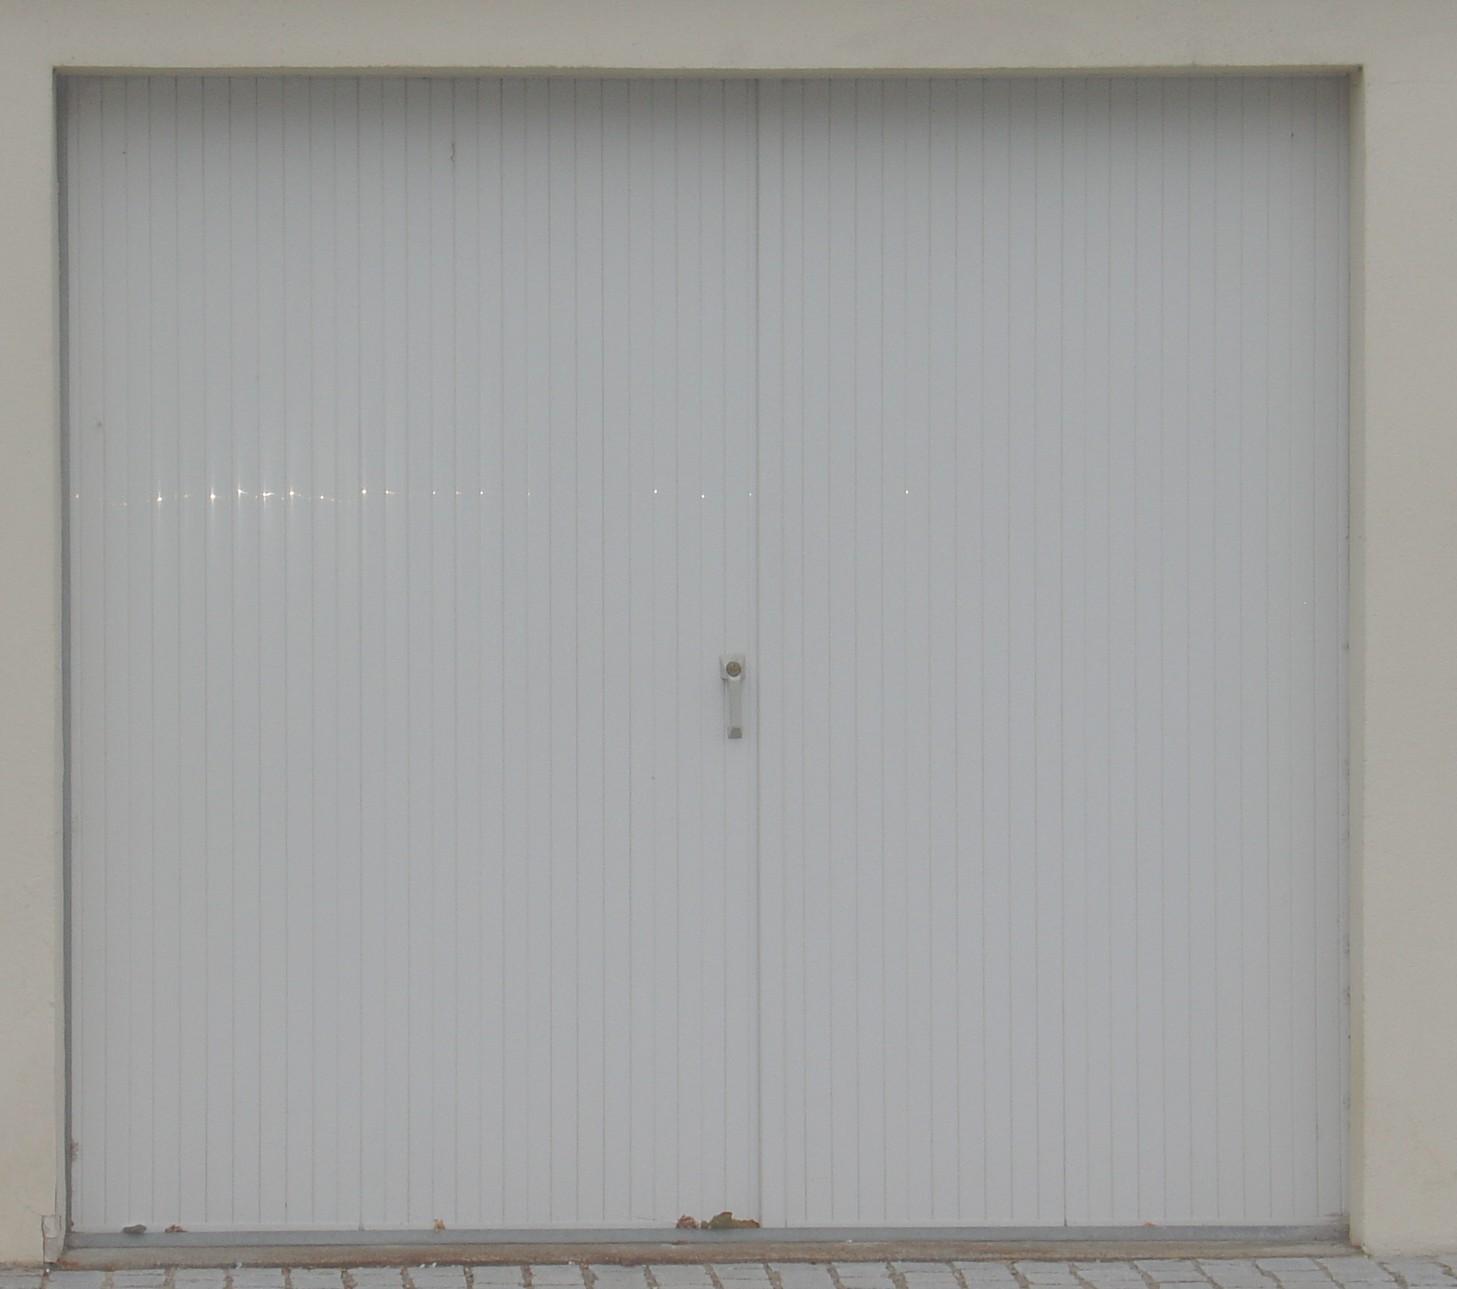 la porte of 24mm sur cadre corni re correze fermetures. Black Bedroom Furniture Sets. Home Design Ideas